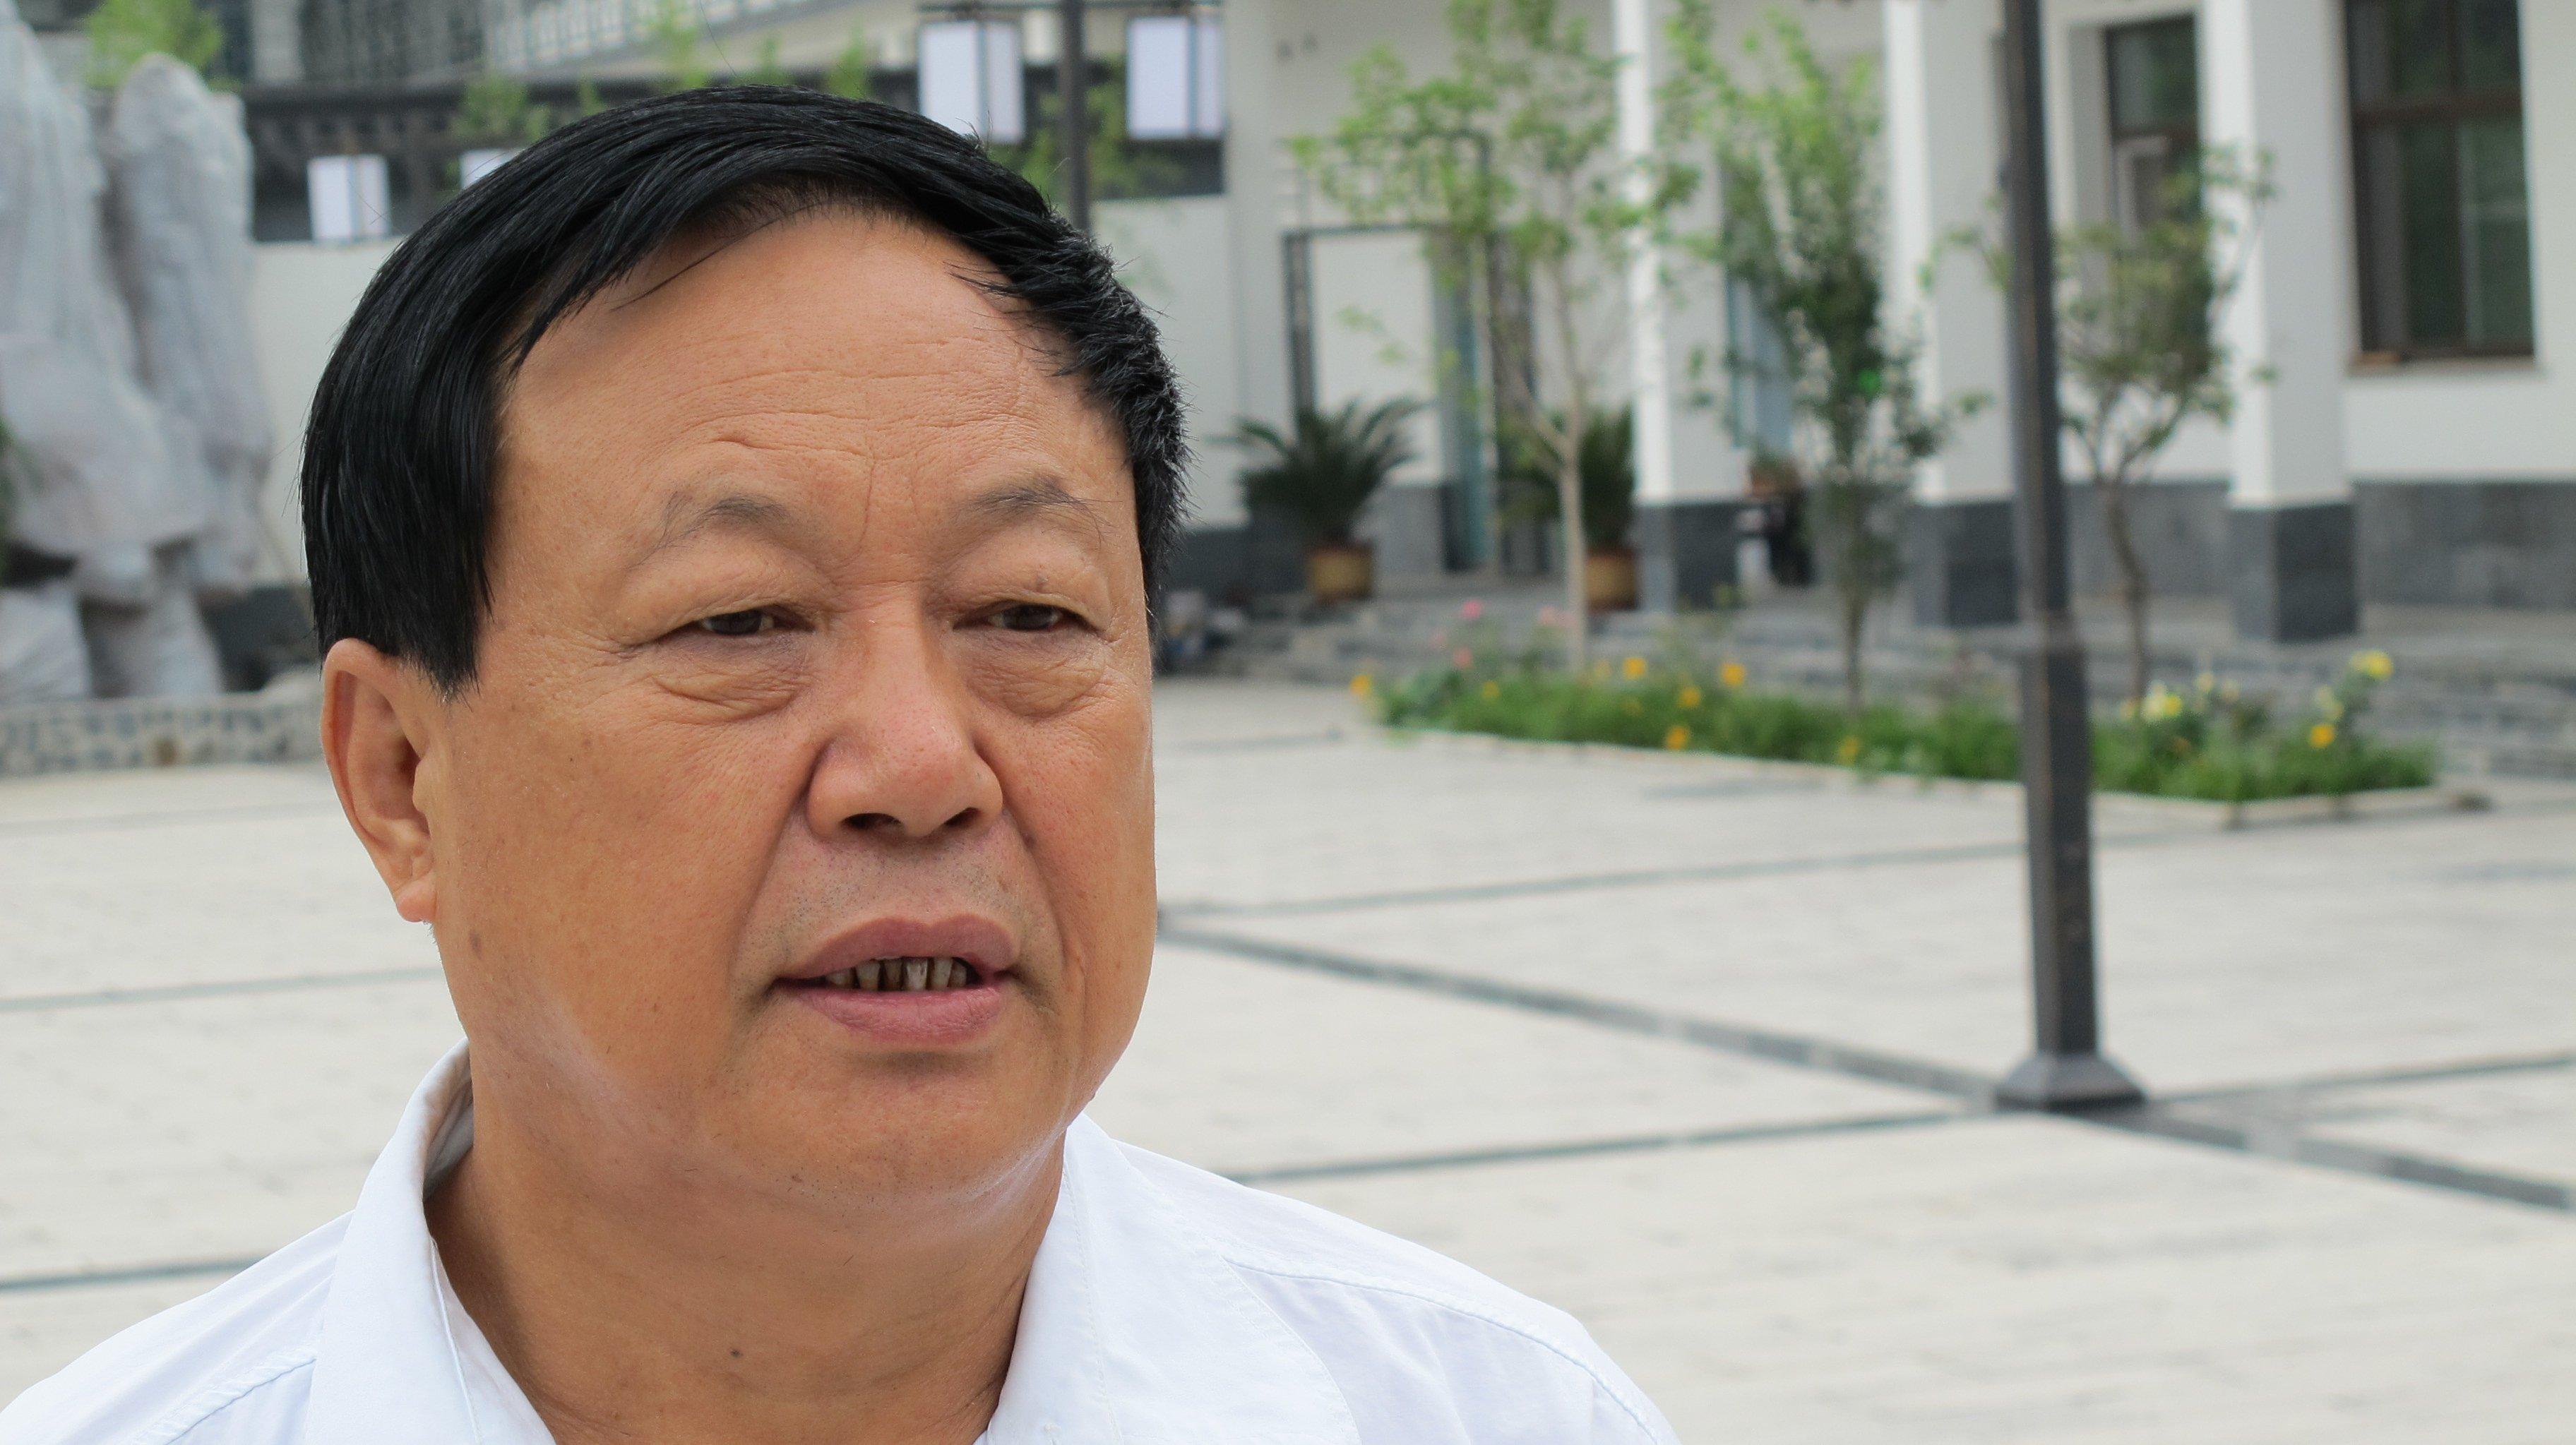 BAODING, CHINA - AUGUST 1: Chinese businessman Sun Dawu talks i